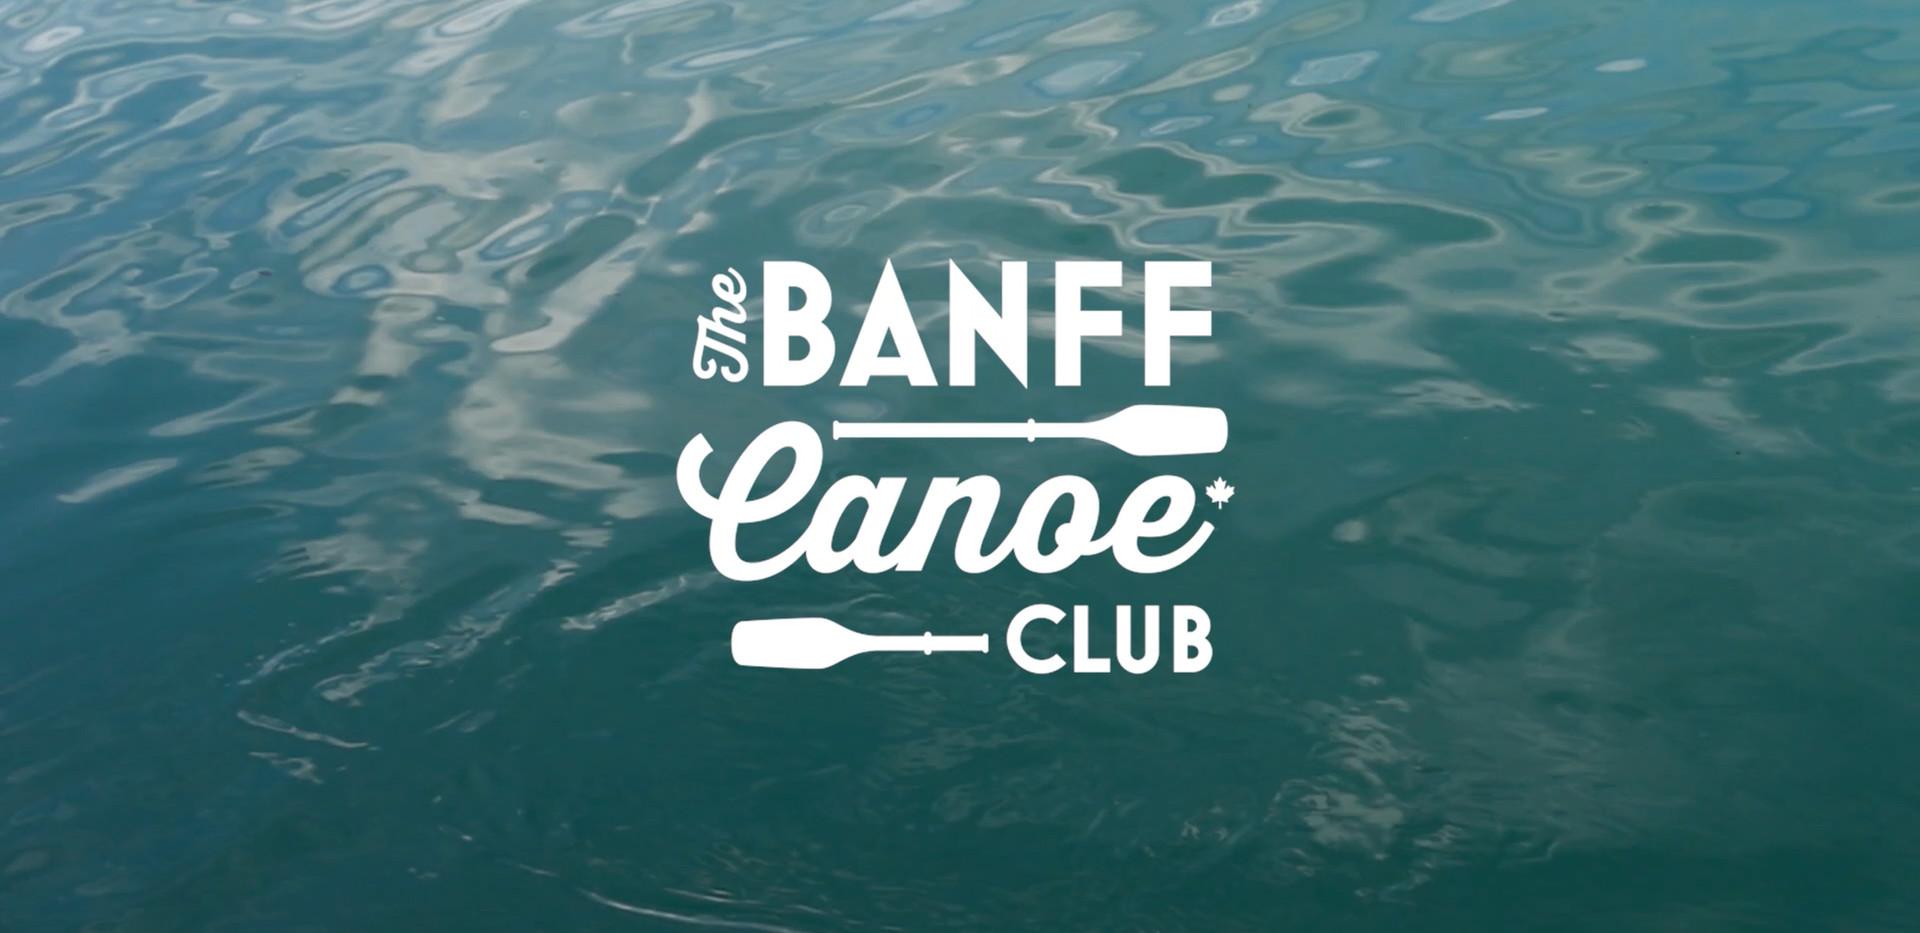 Banff Canoe Club